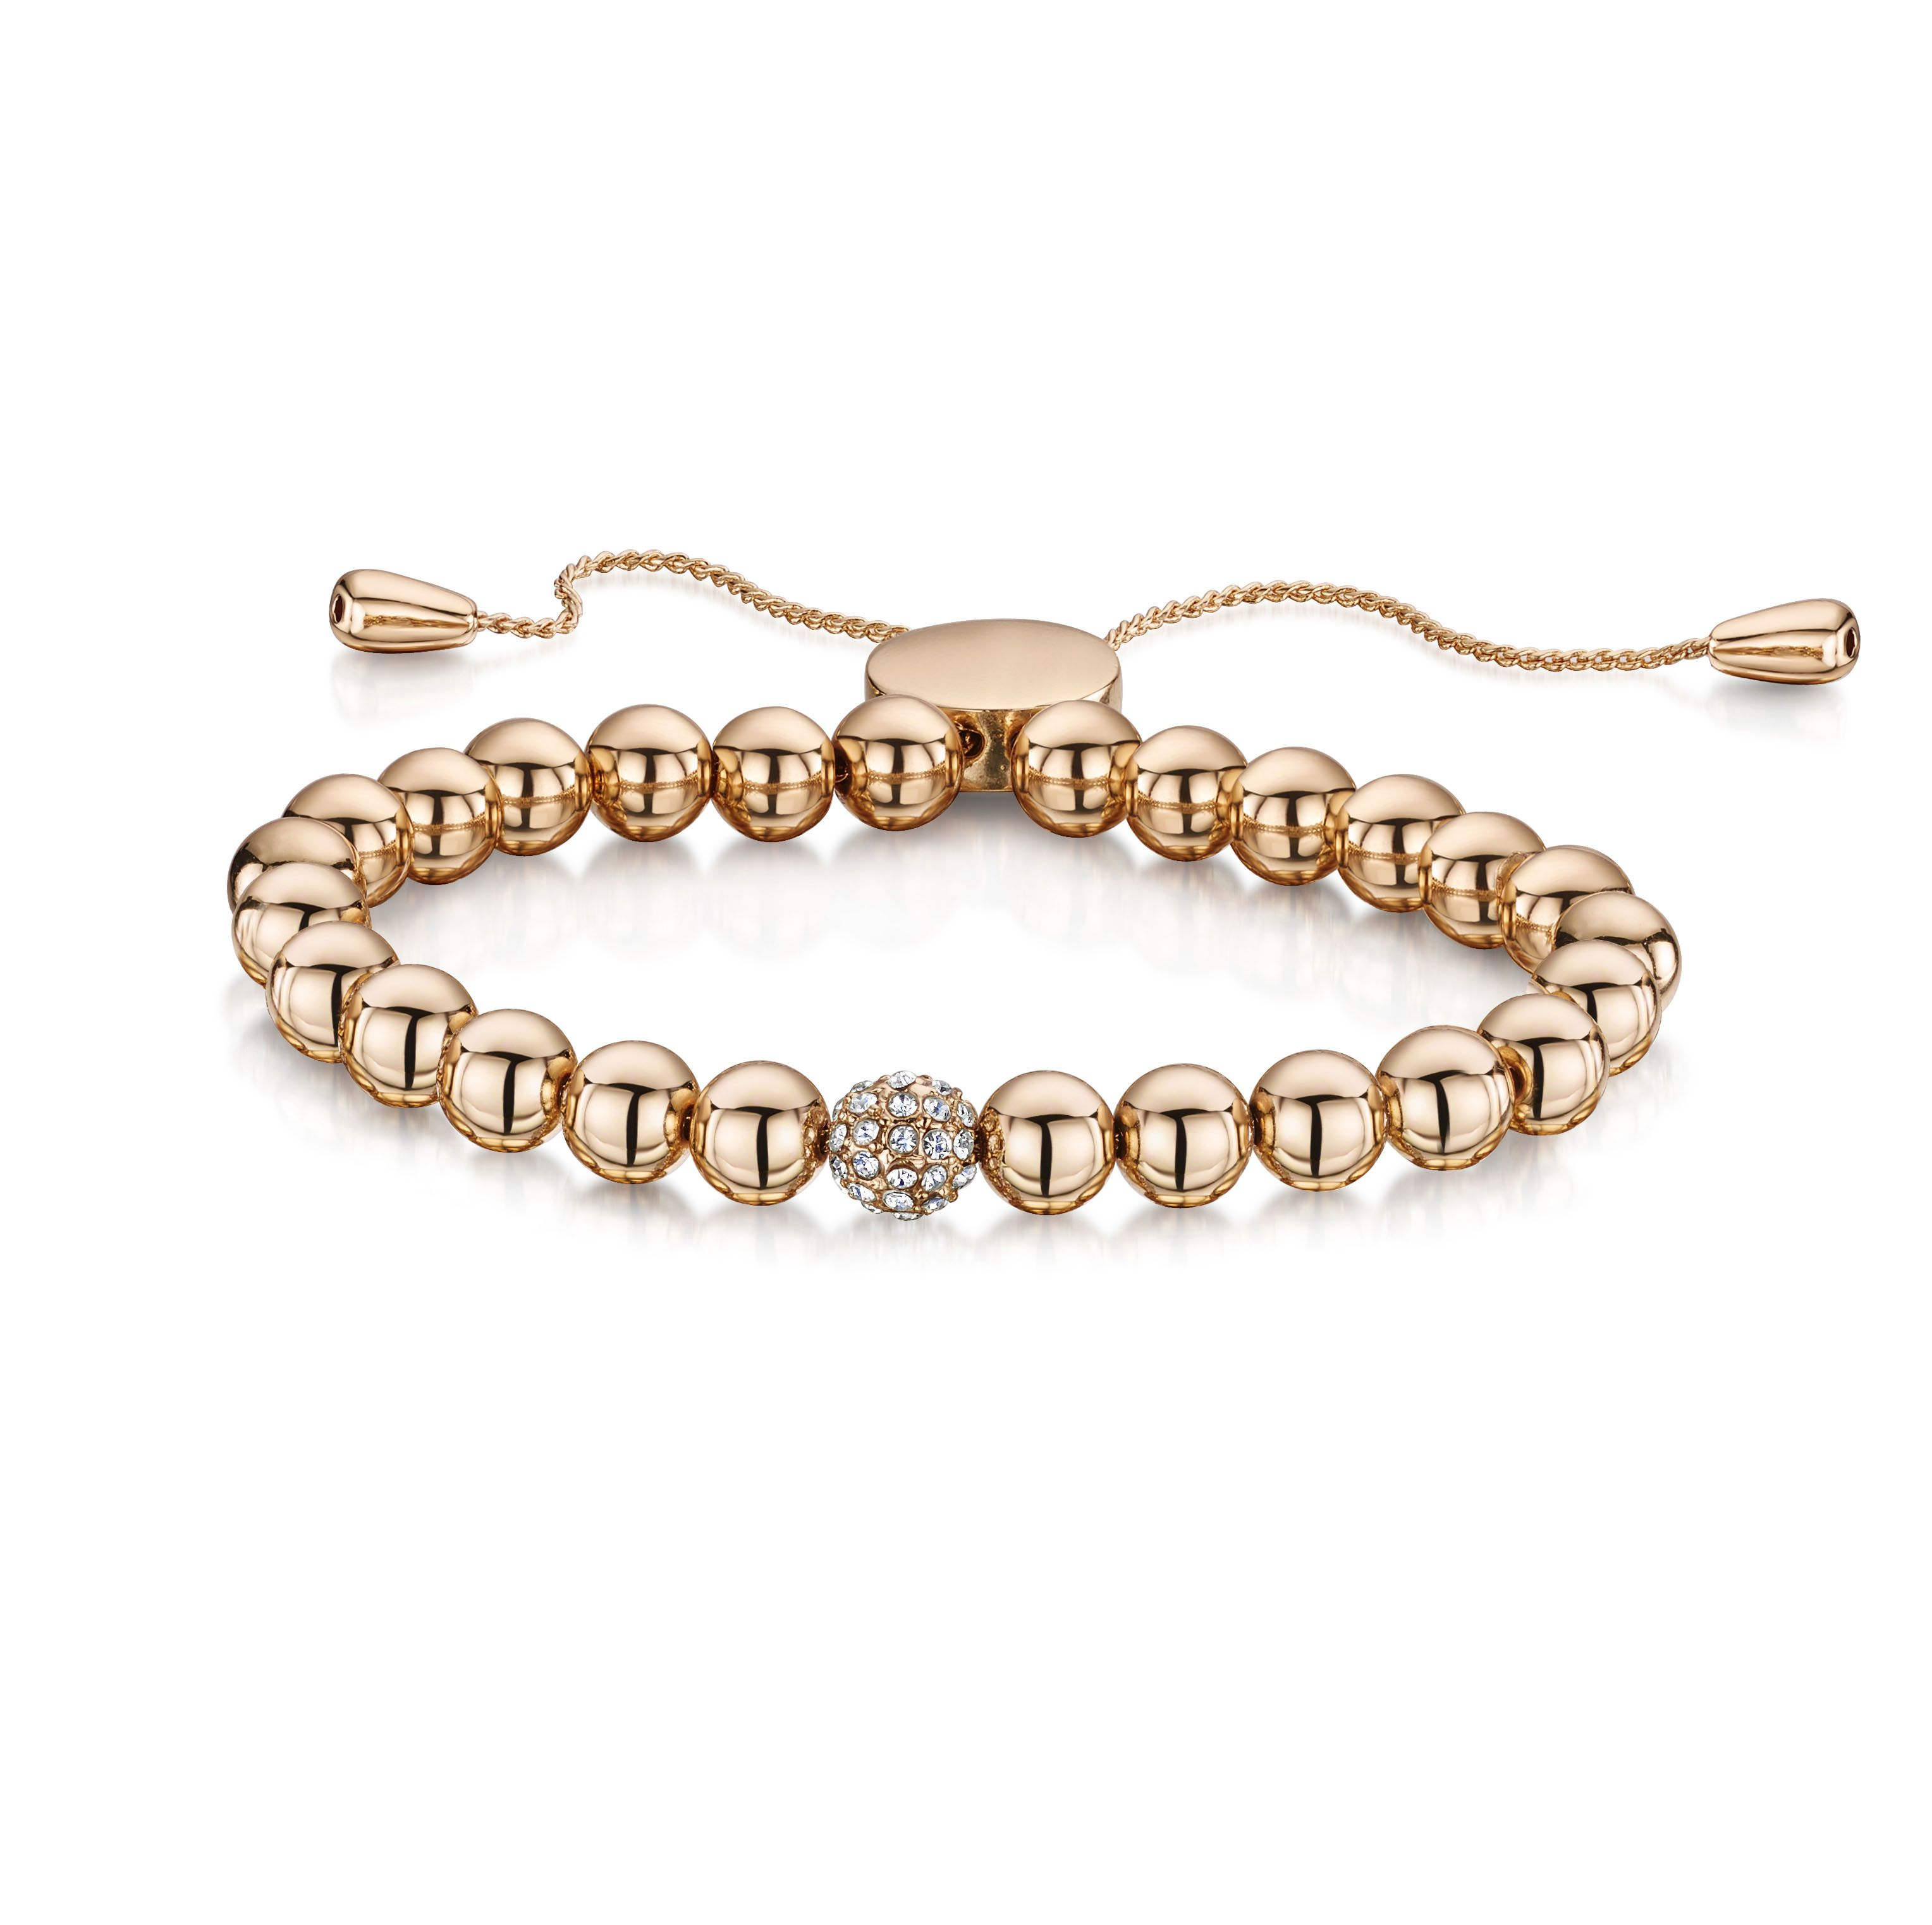 Buckley London Simplicity Bracelet - Rose Gold (Snowball Design)